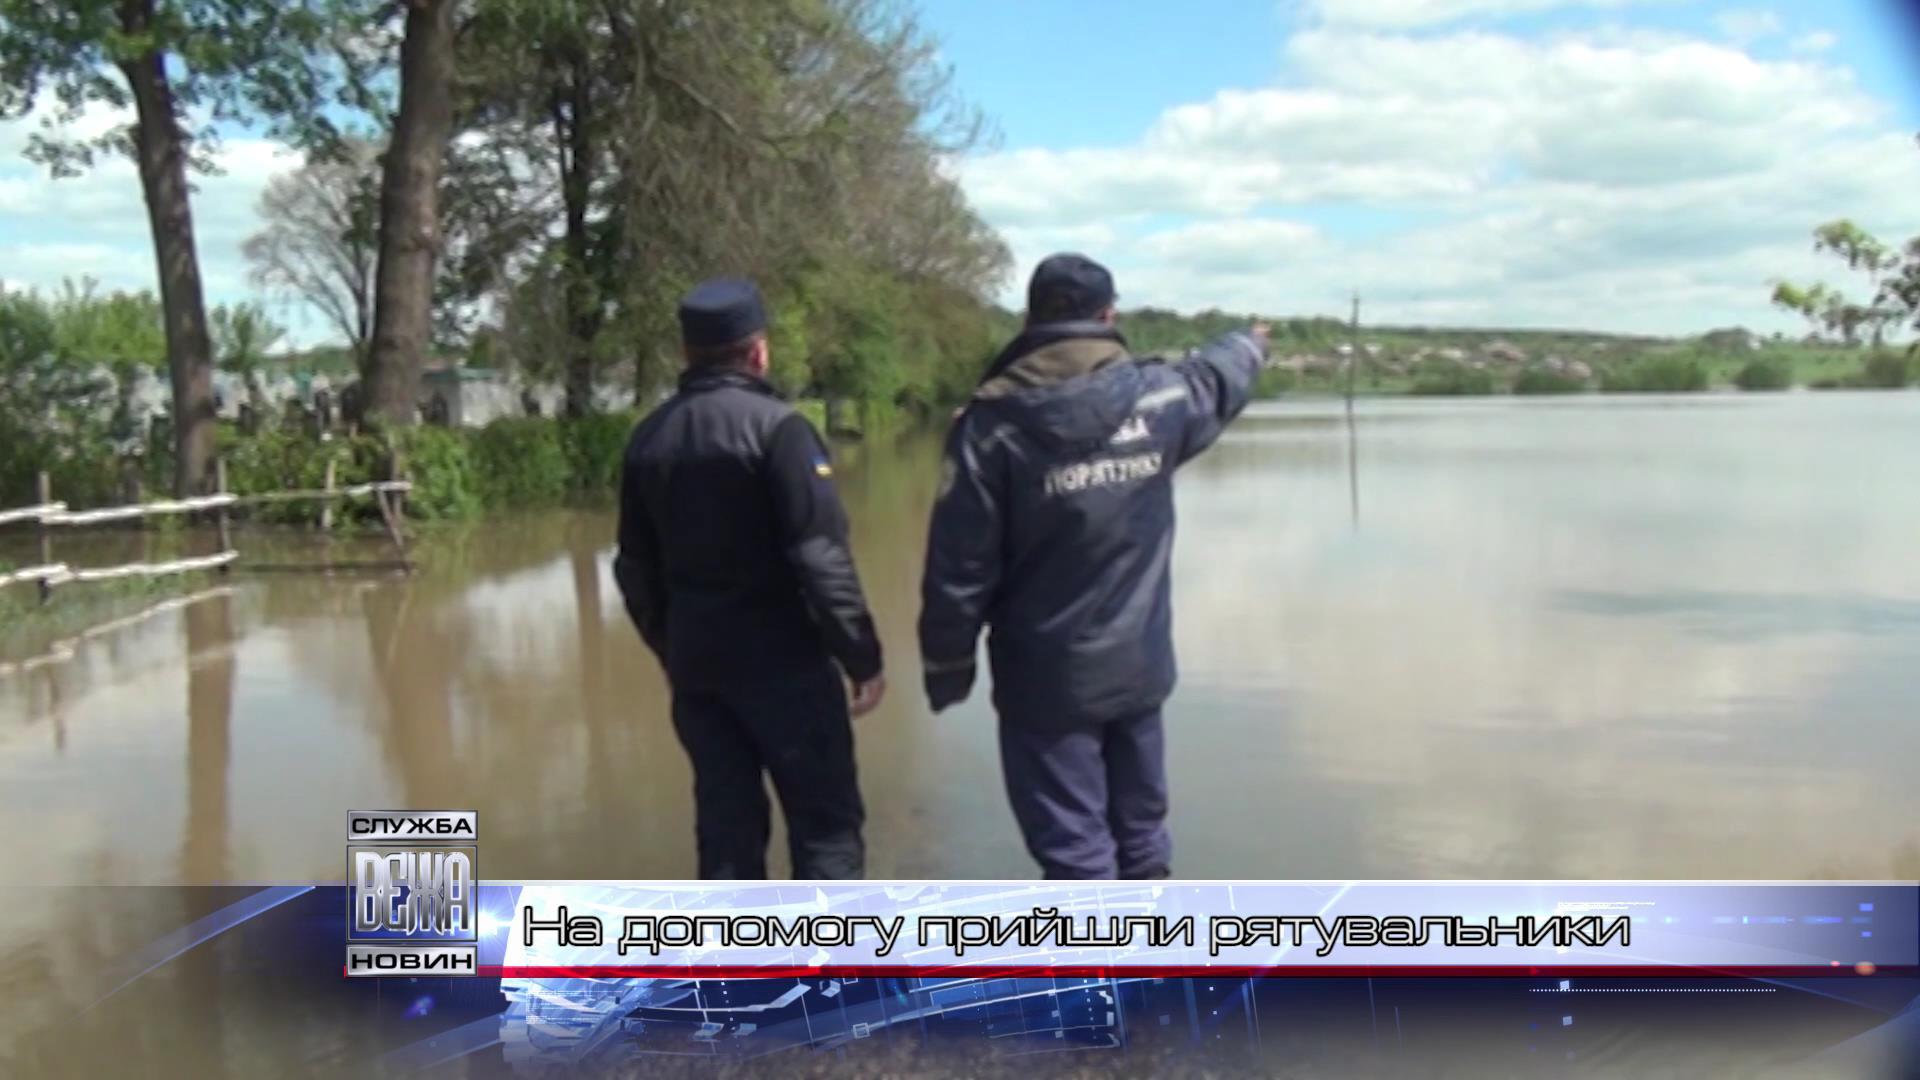 На допомогу прийшли рятувальники[16-53-23]